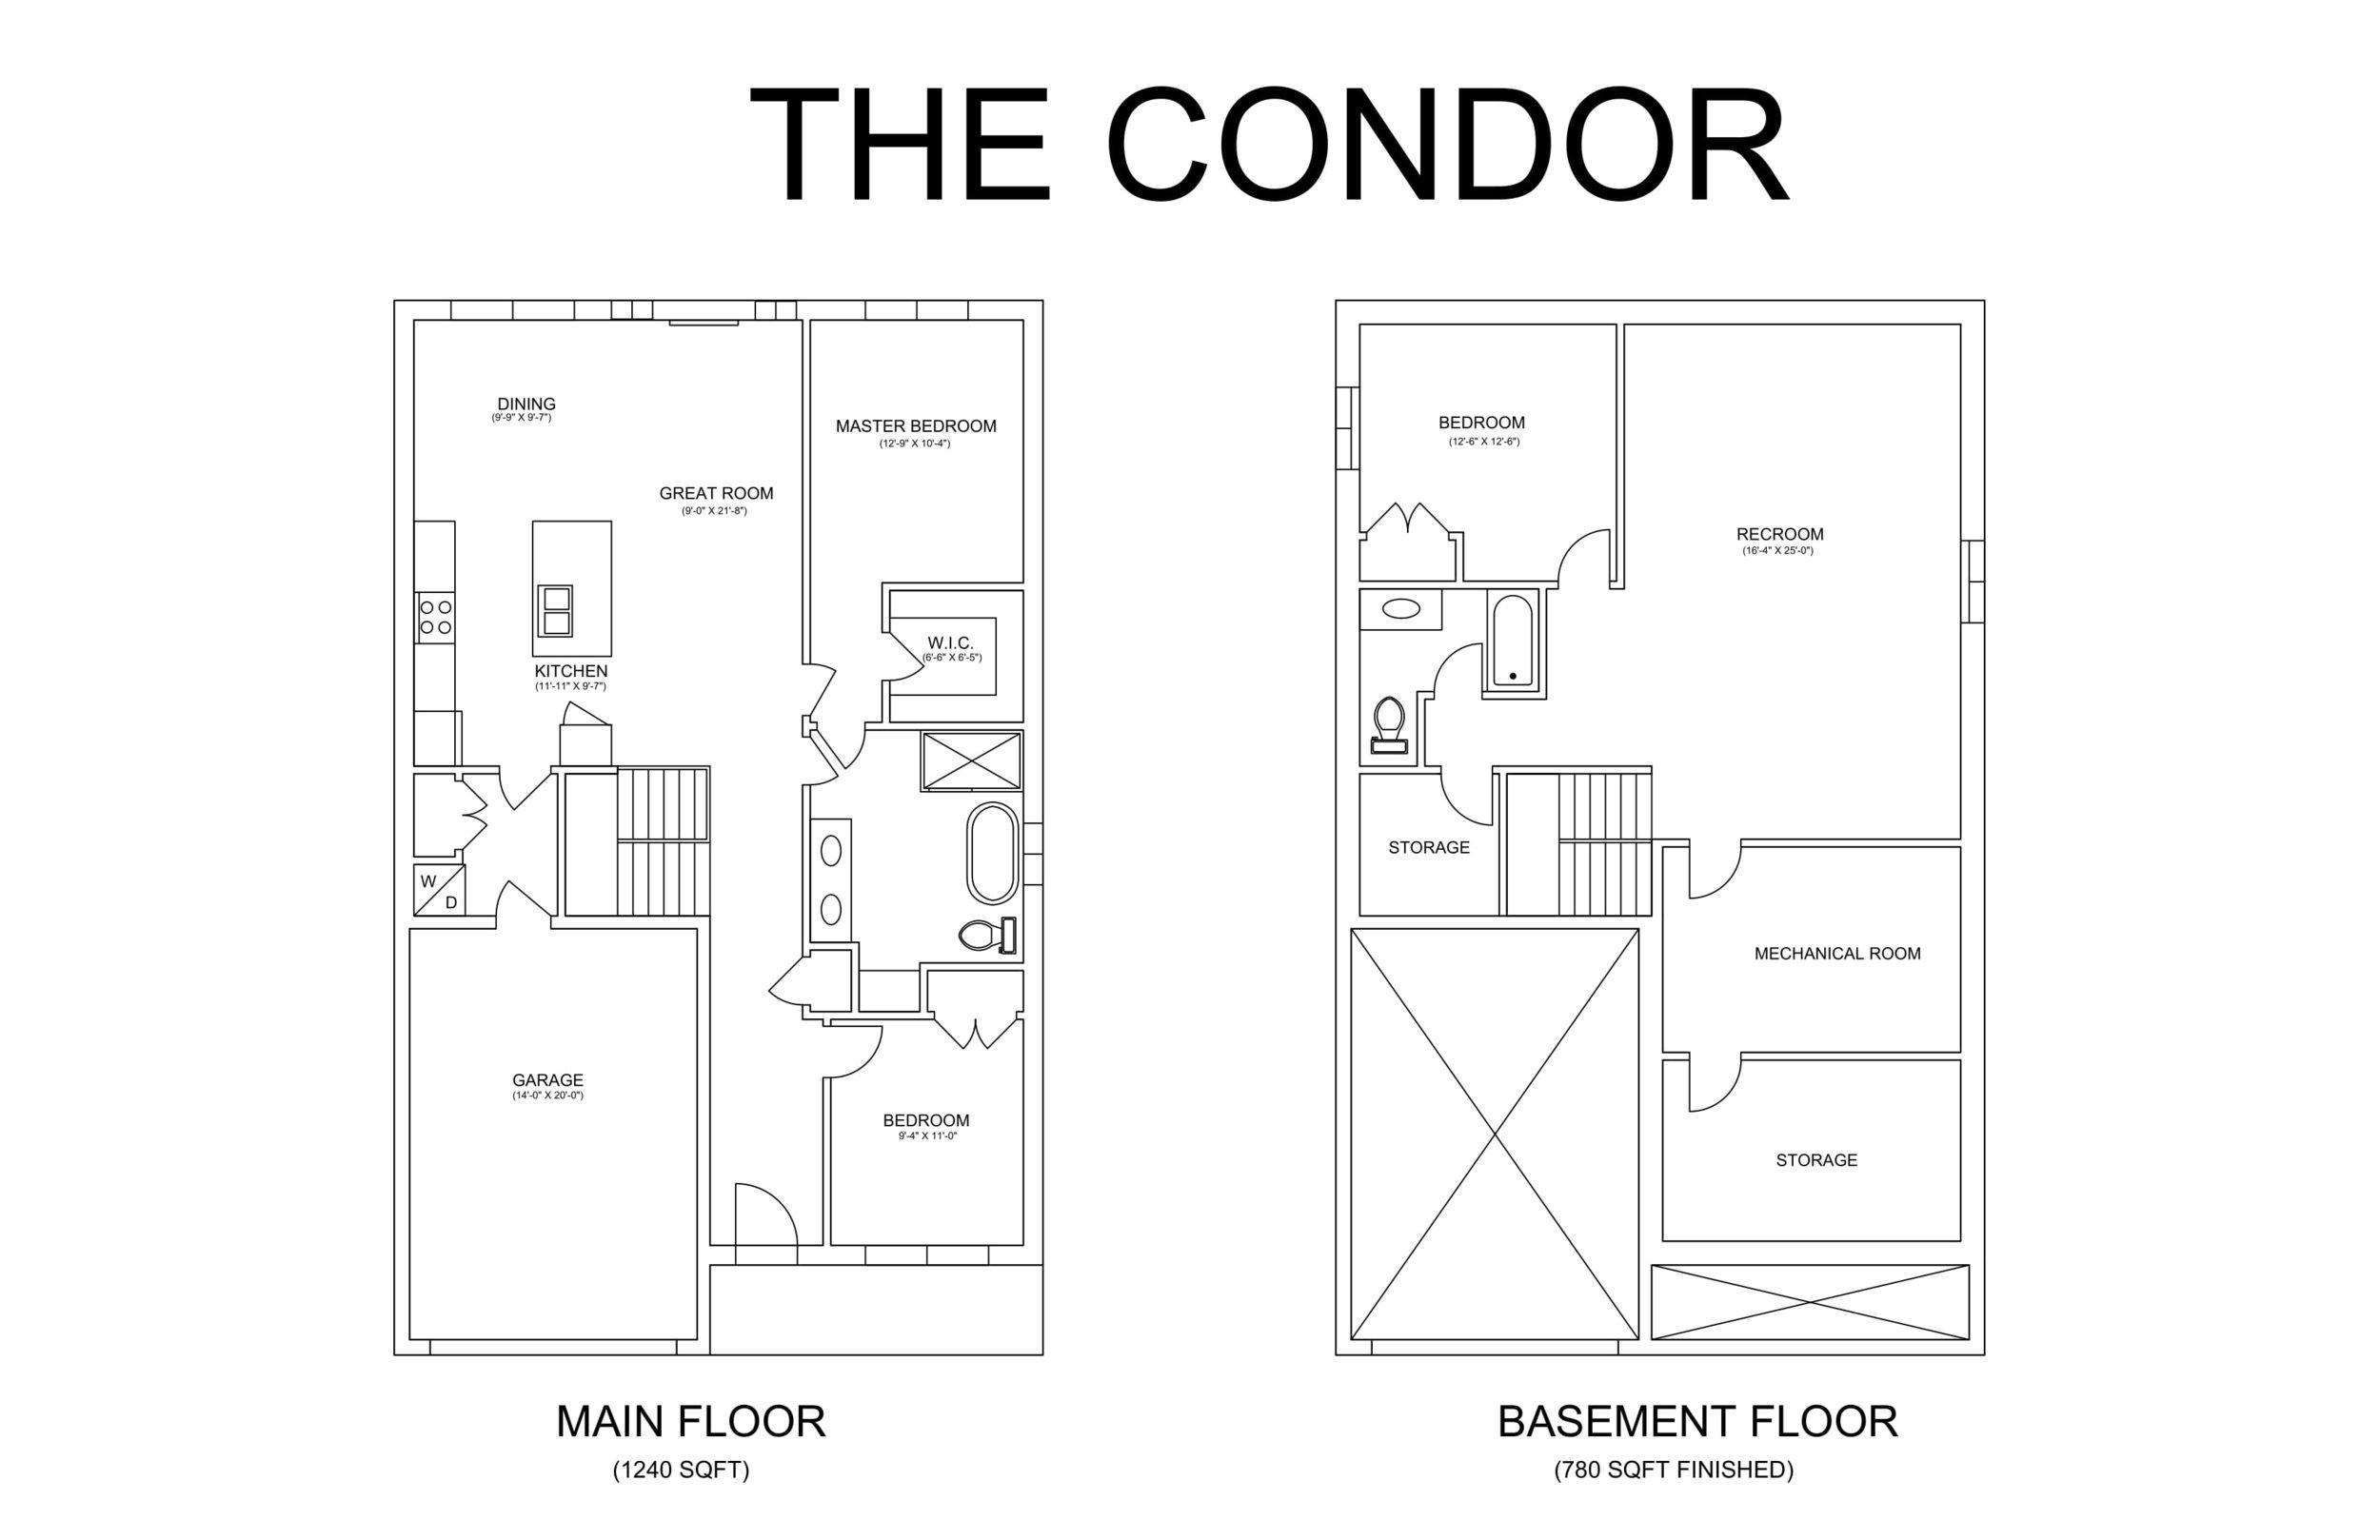 Southgrove model CONDOR CLEAN-Layout1-1.jpg